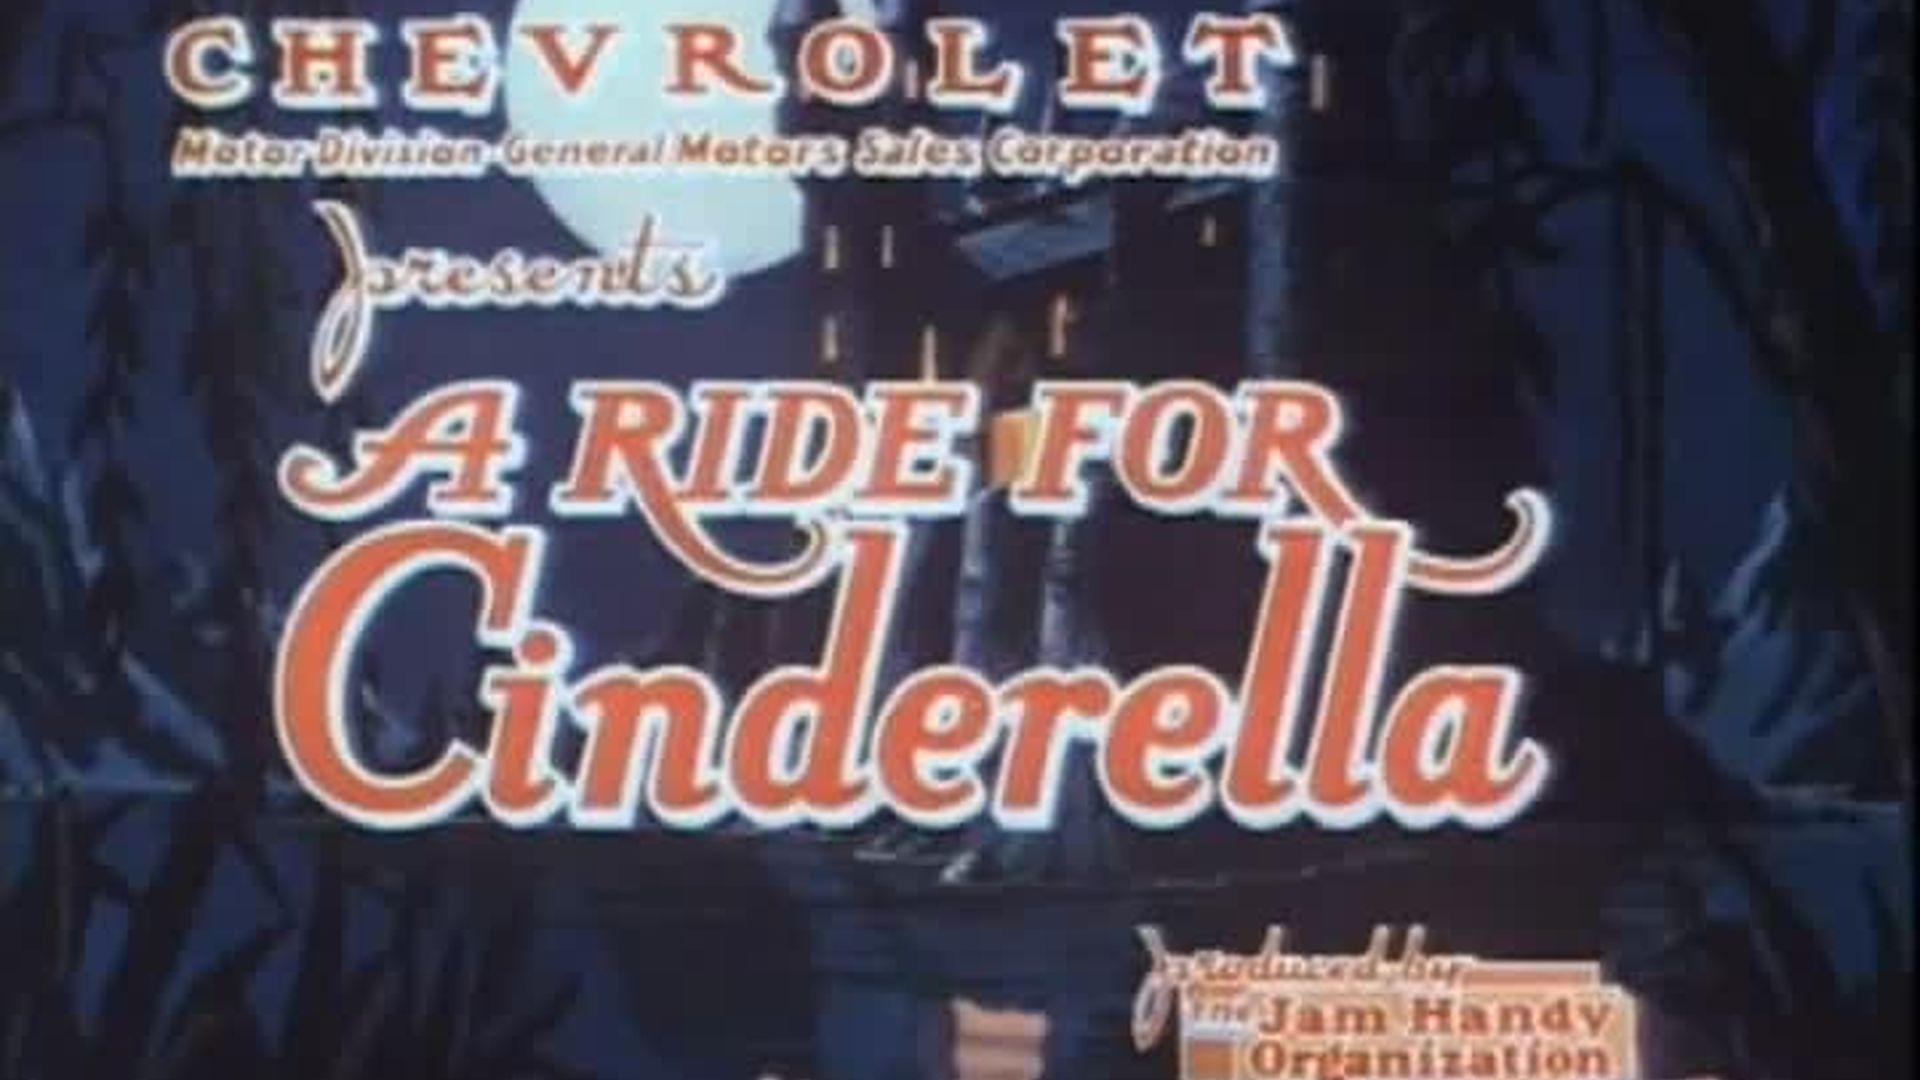 A Ride for Cinderella